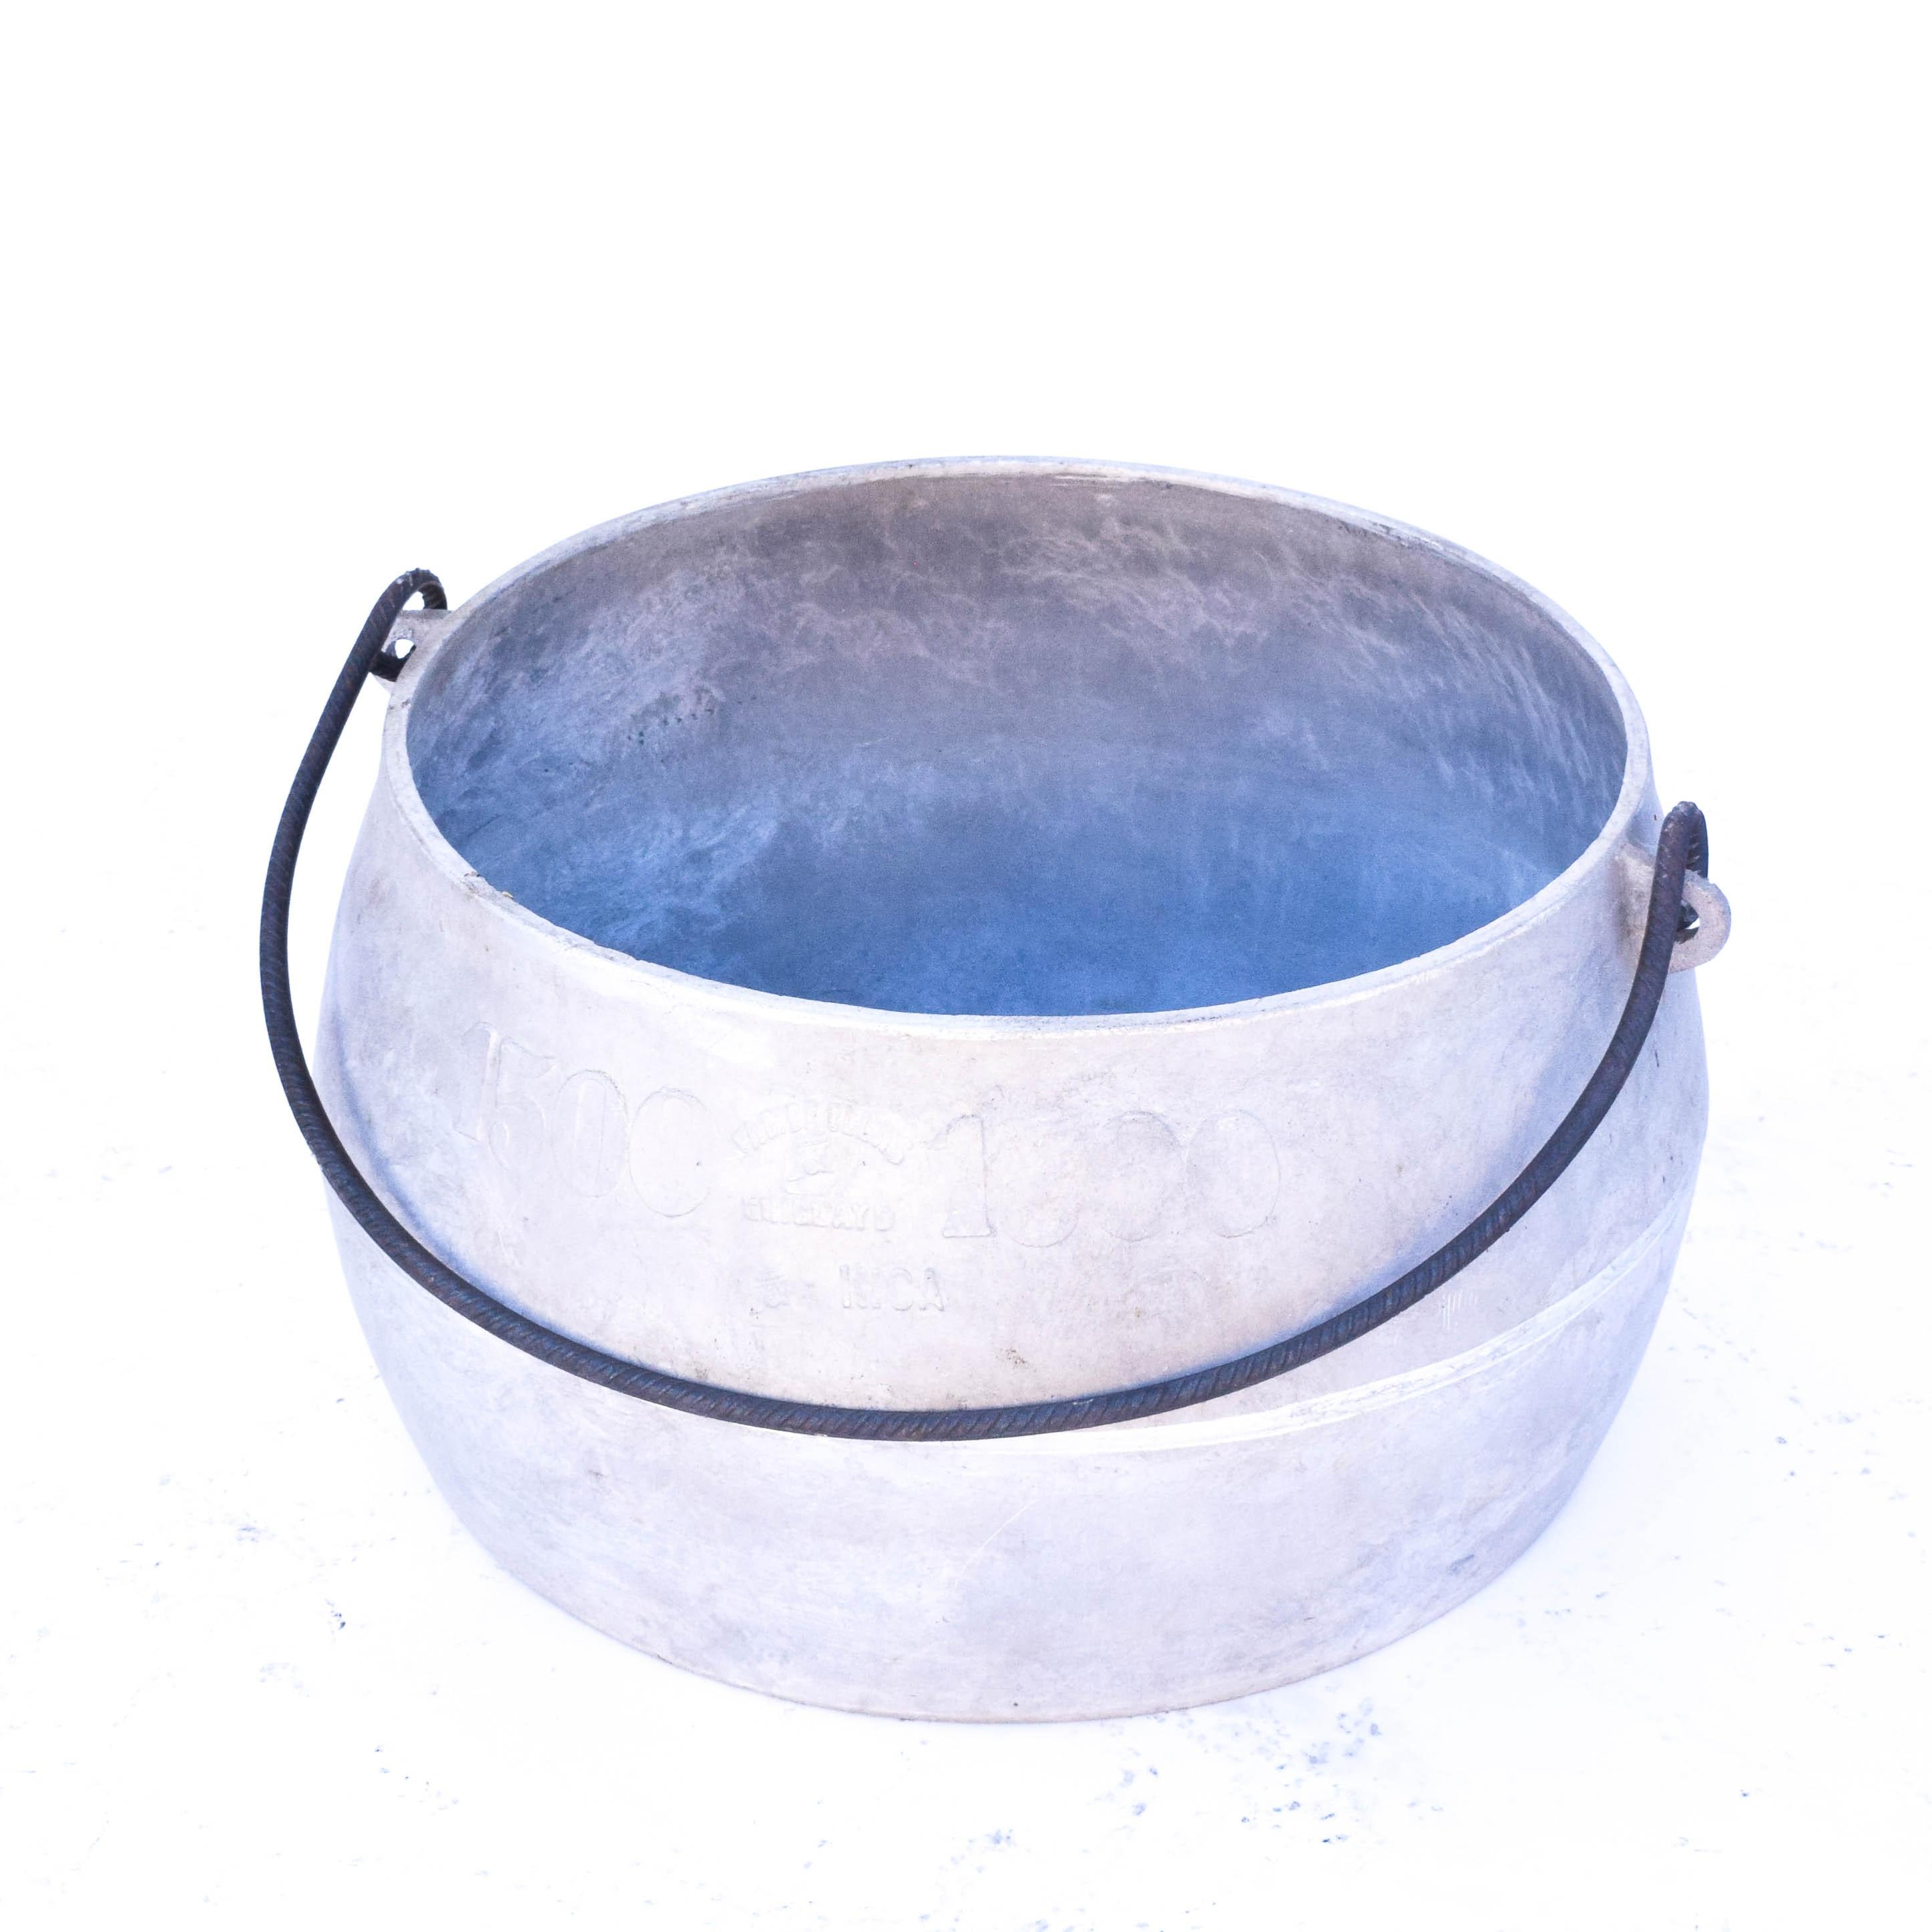 "Galvanized Aluminum Bucket Marked ""Chicolaya Peru 1500"""